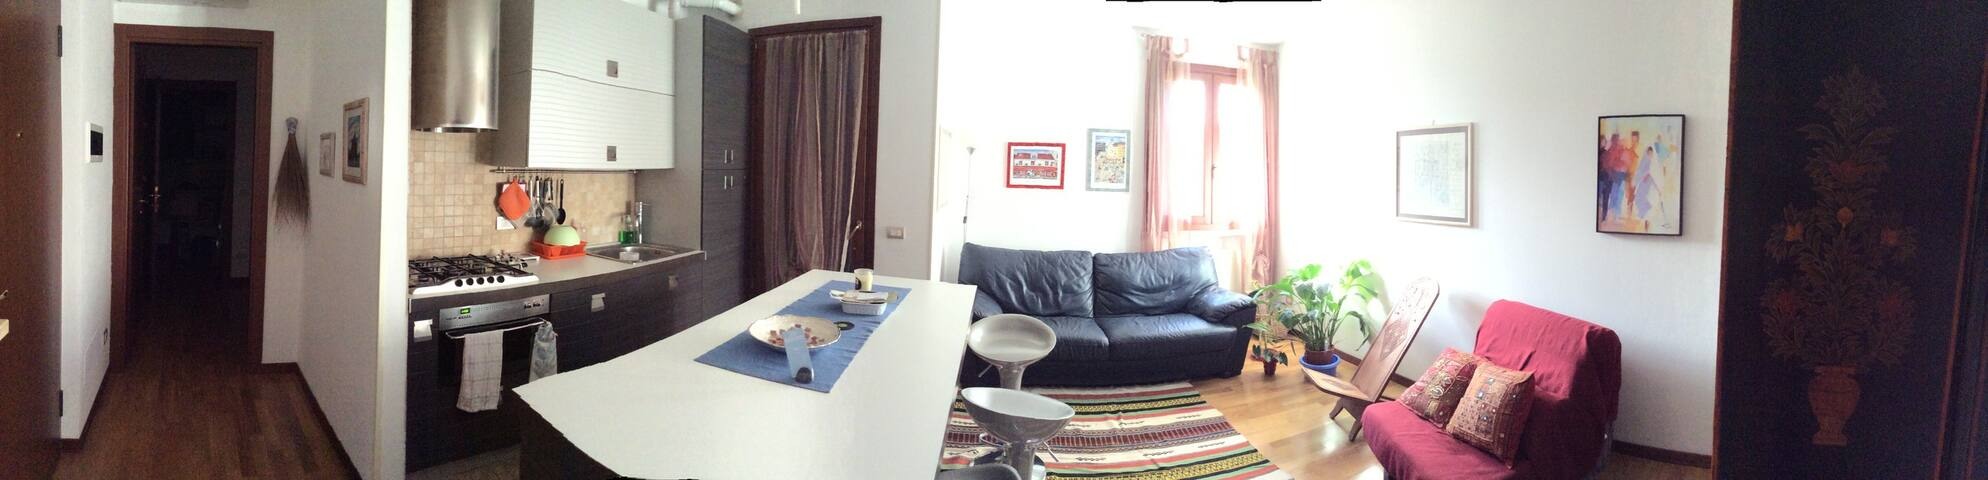 Casa vacanze - Verona - Raldon - Wohnung